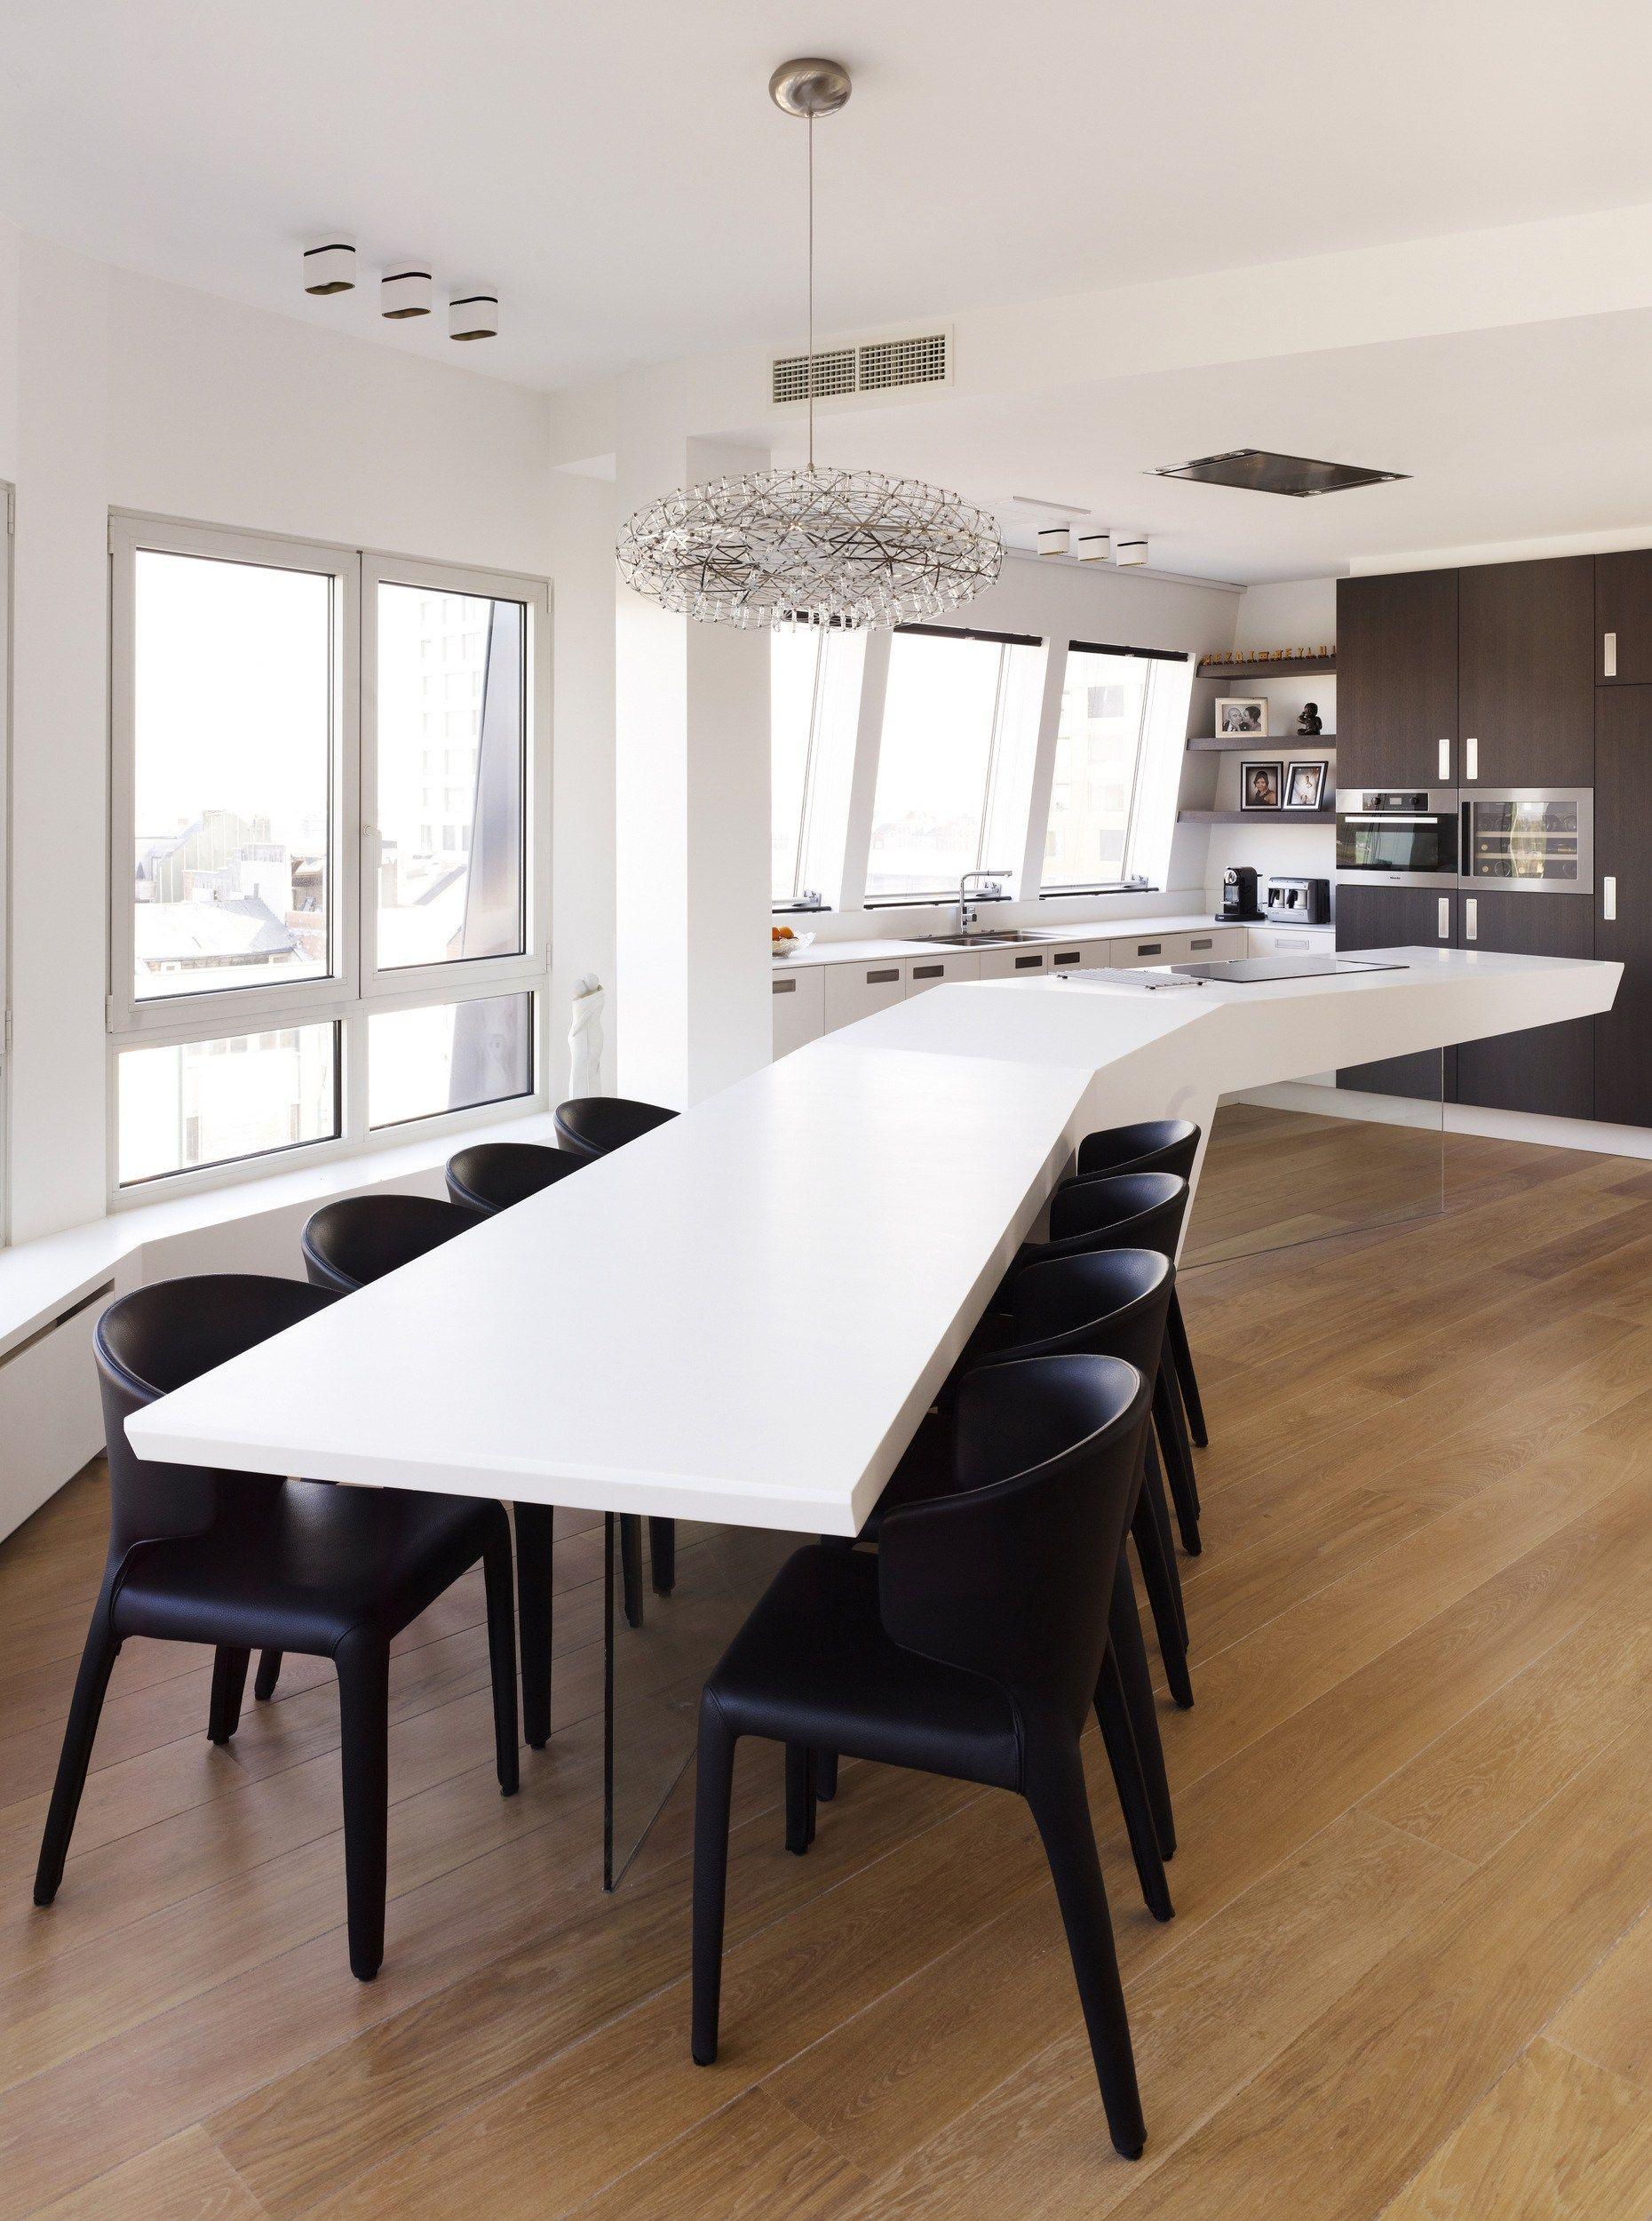 Küche k design küchenarbeitsplatte aus himacs by himacs by lg hausys europe